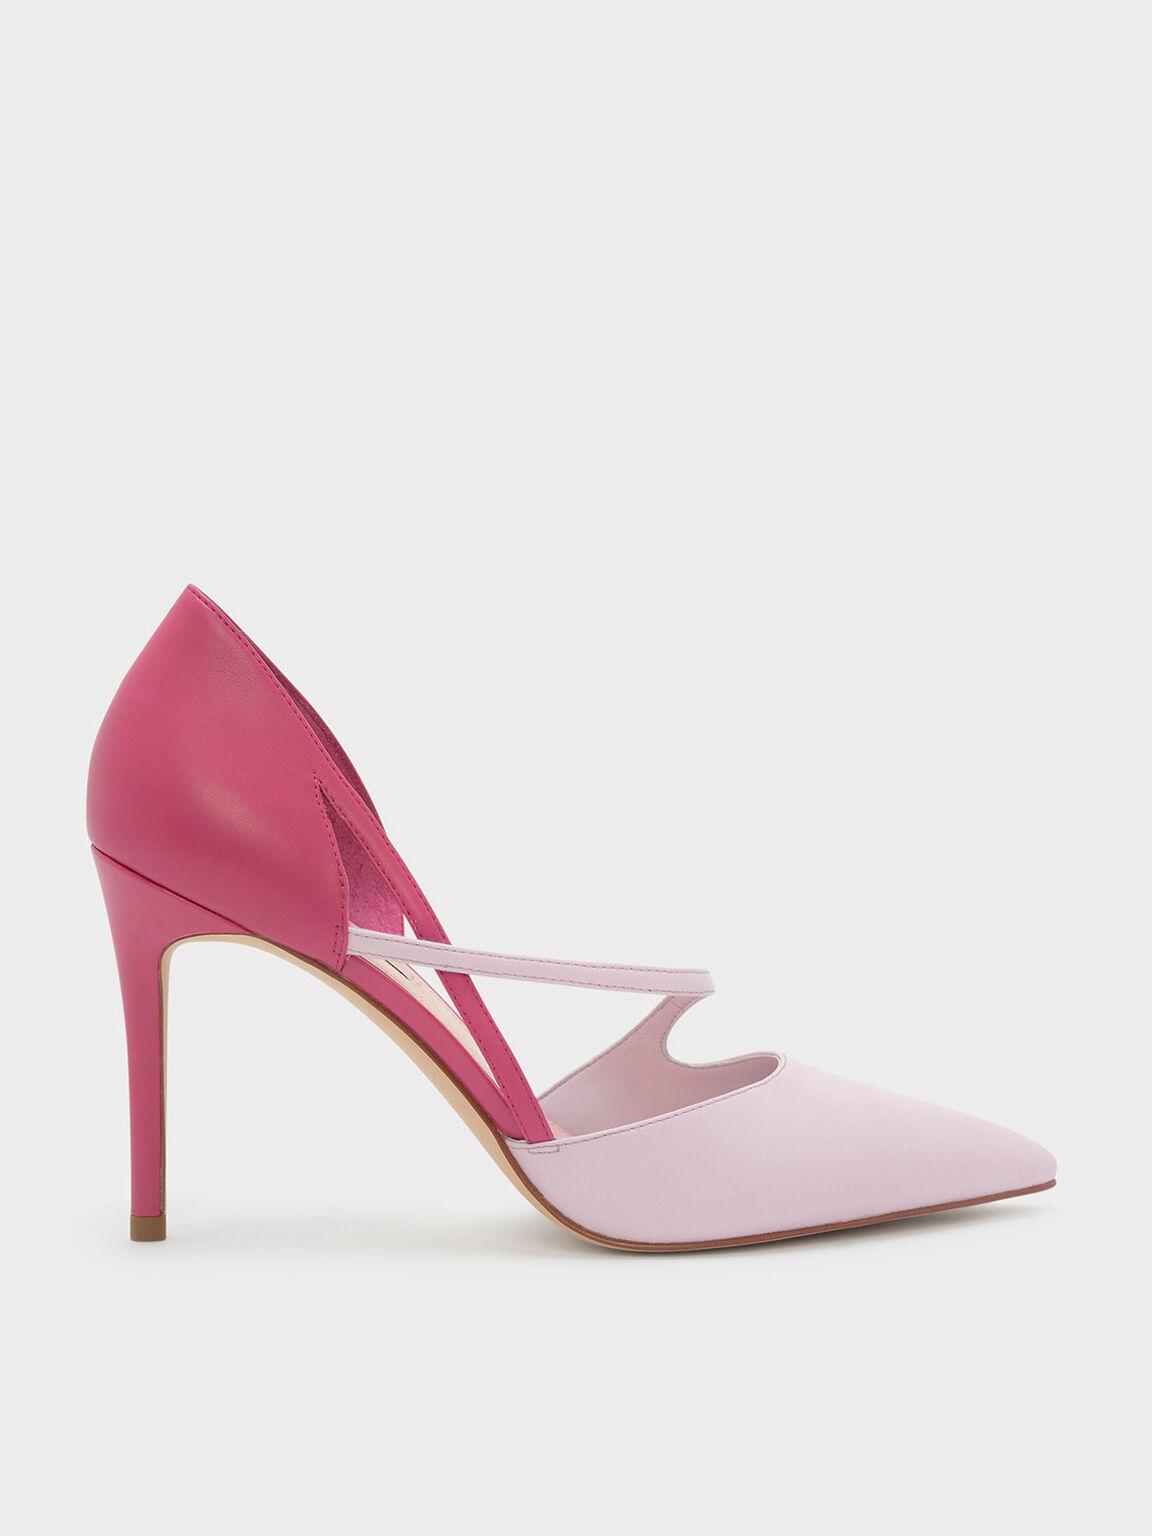 Asymmetrical Strap D'orsay Pumps, Pink, hi-res